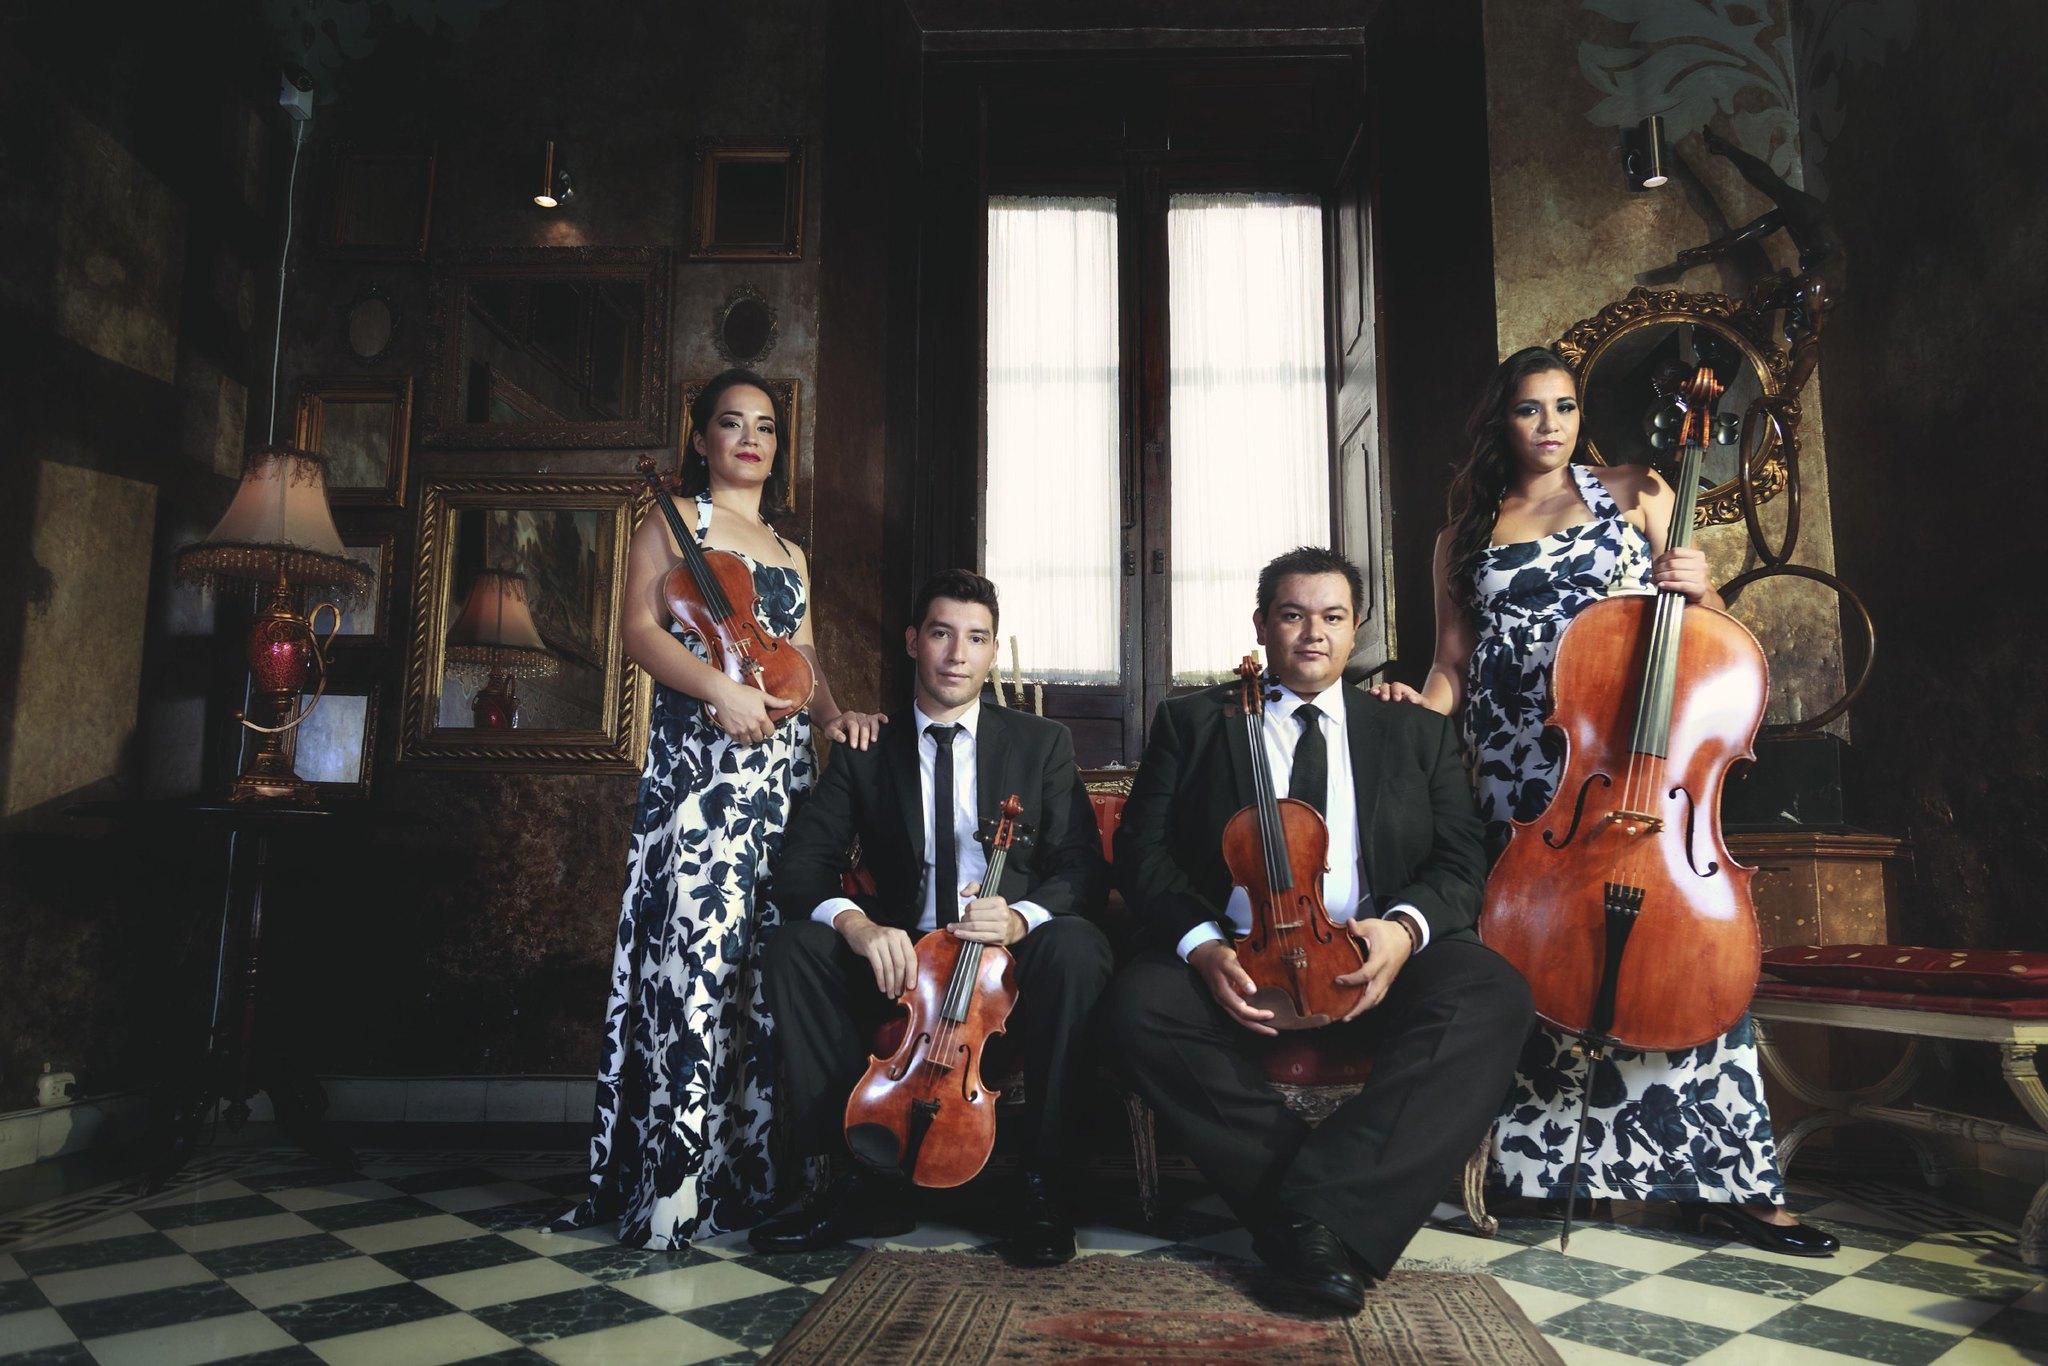 Activa Cultura Jalisco rutas culturales con música de cámara